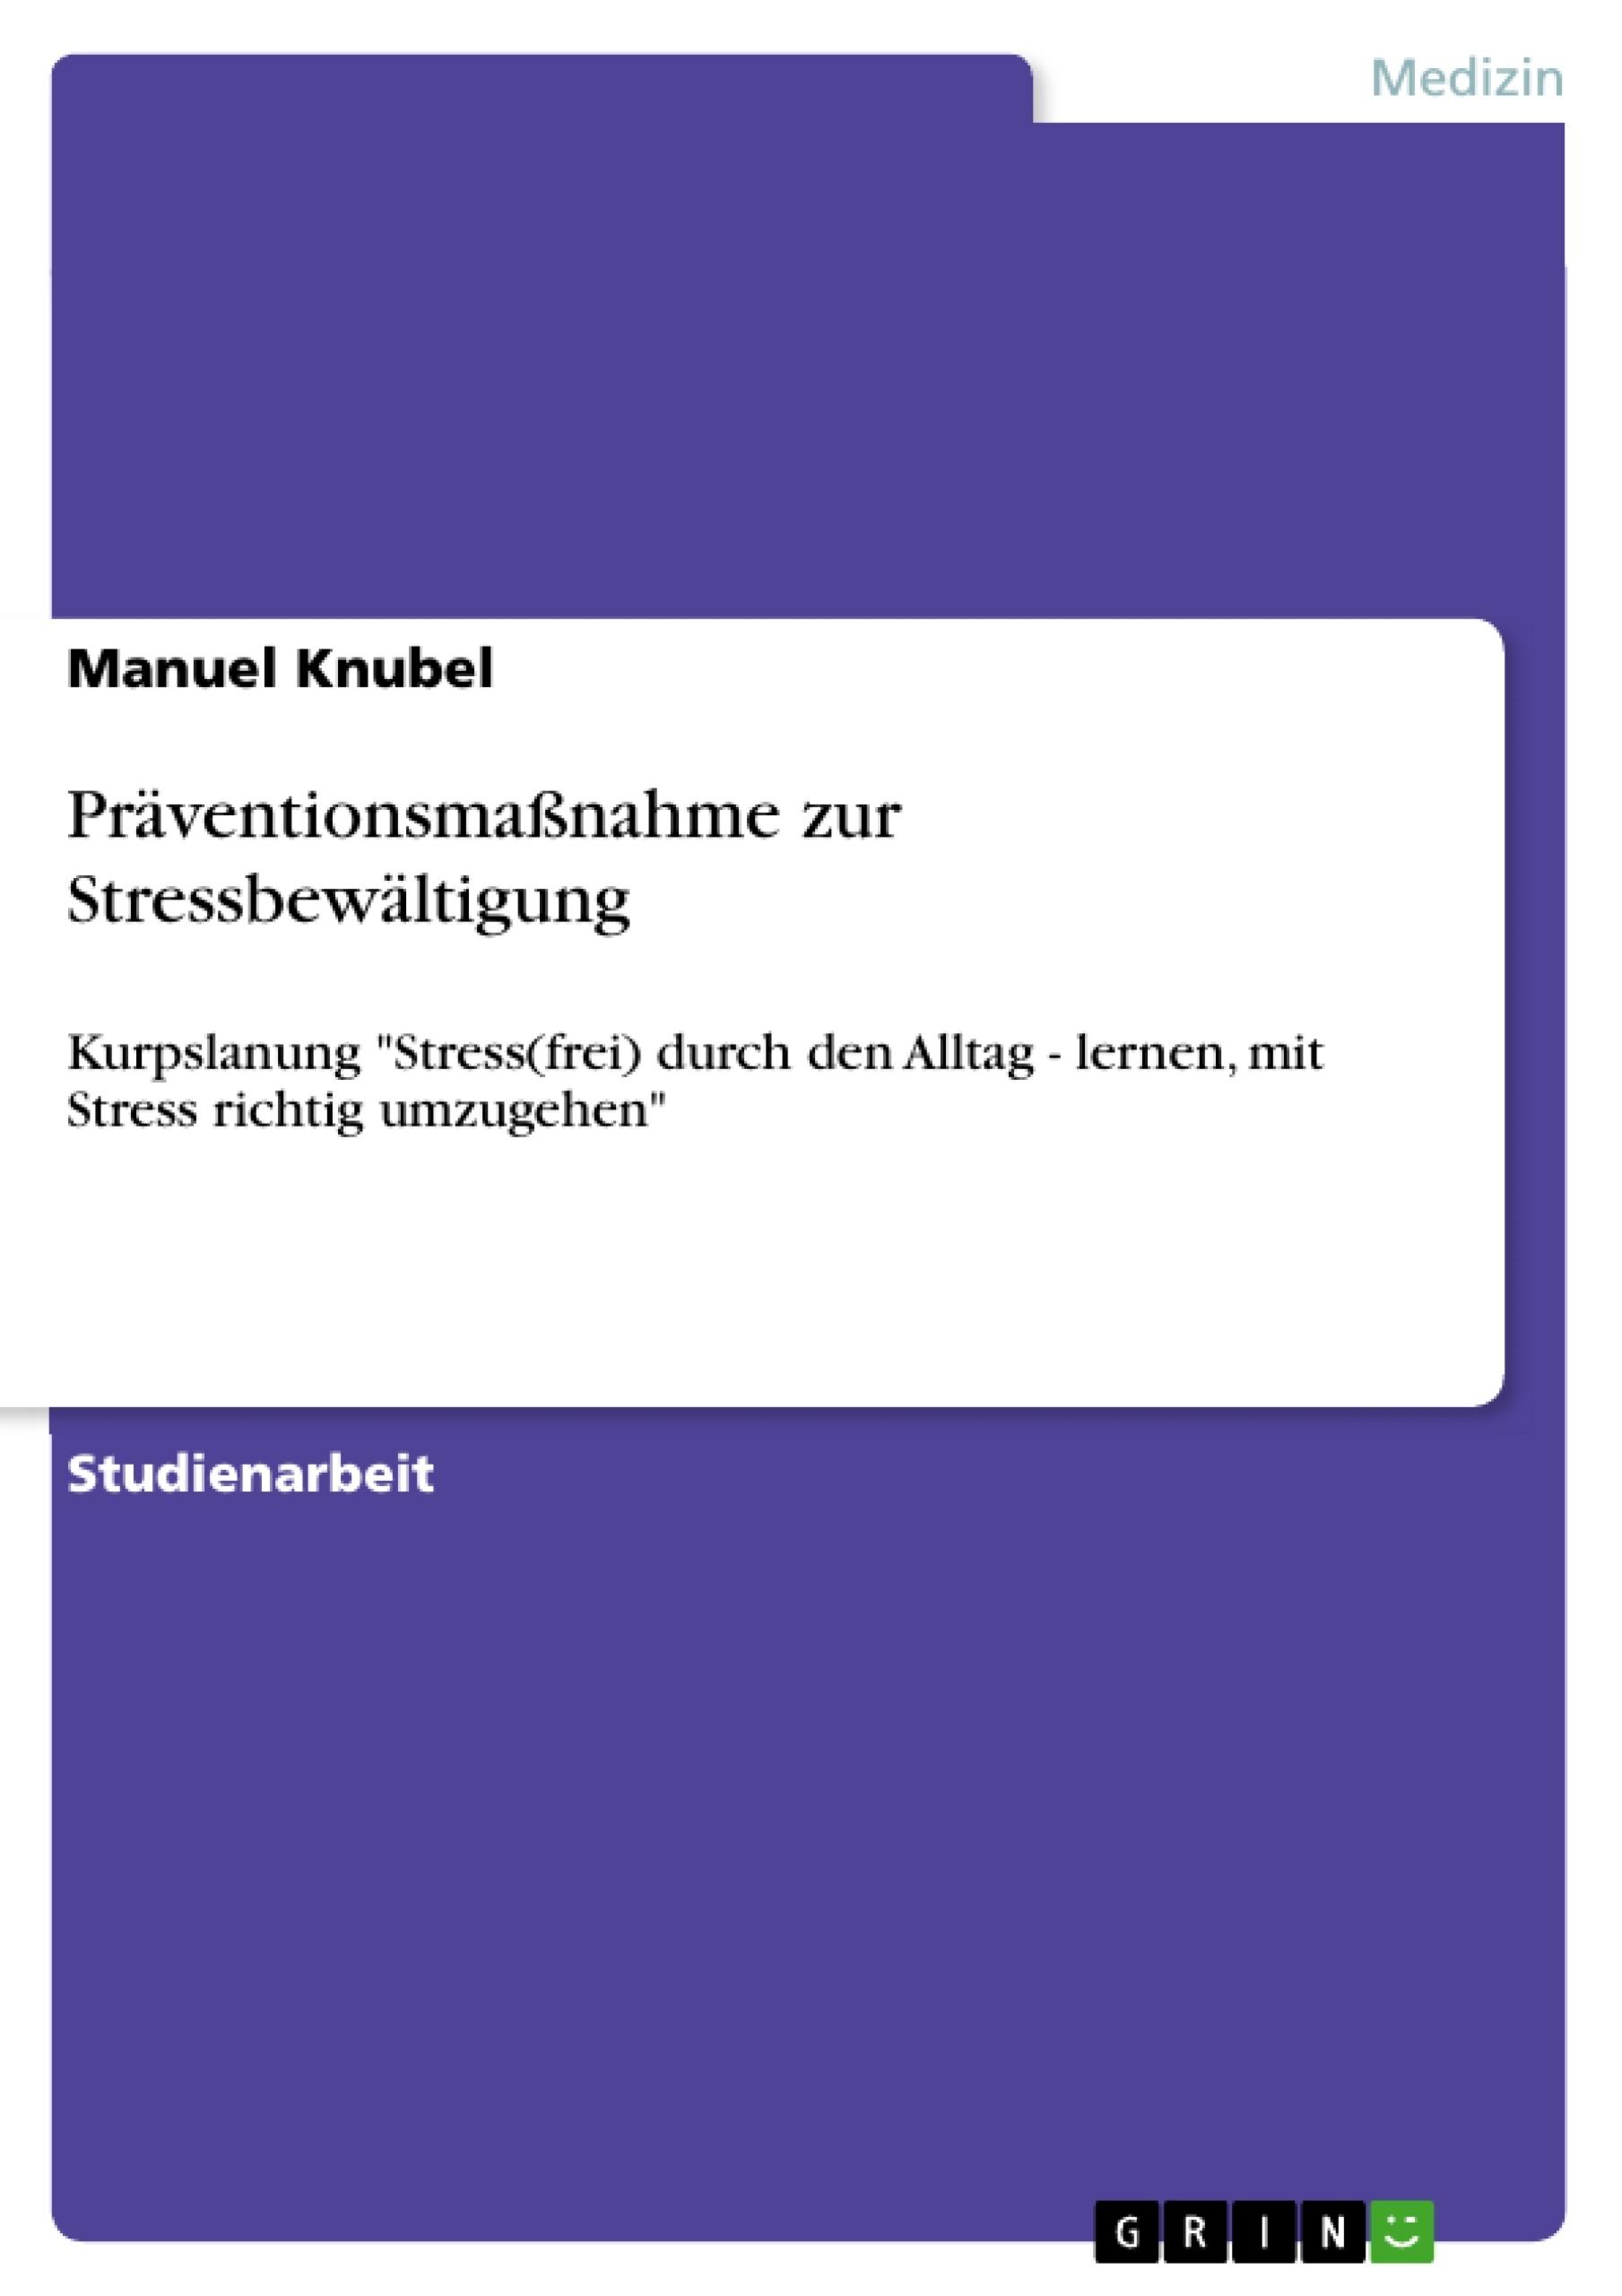 Titel: Präventionsmaßnahme zur Stressbewältigung